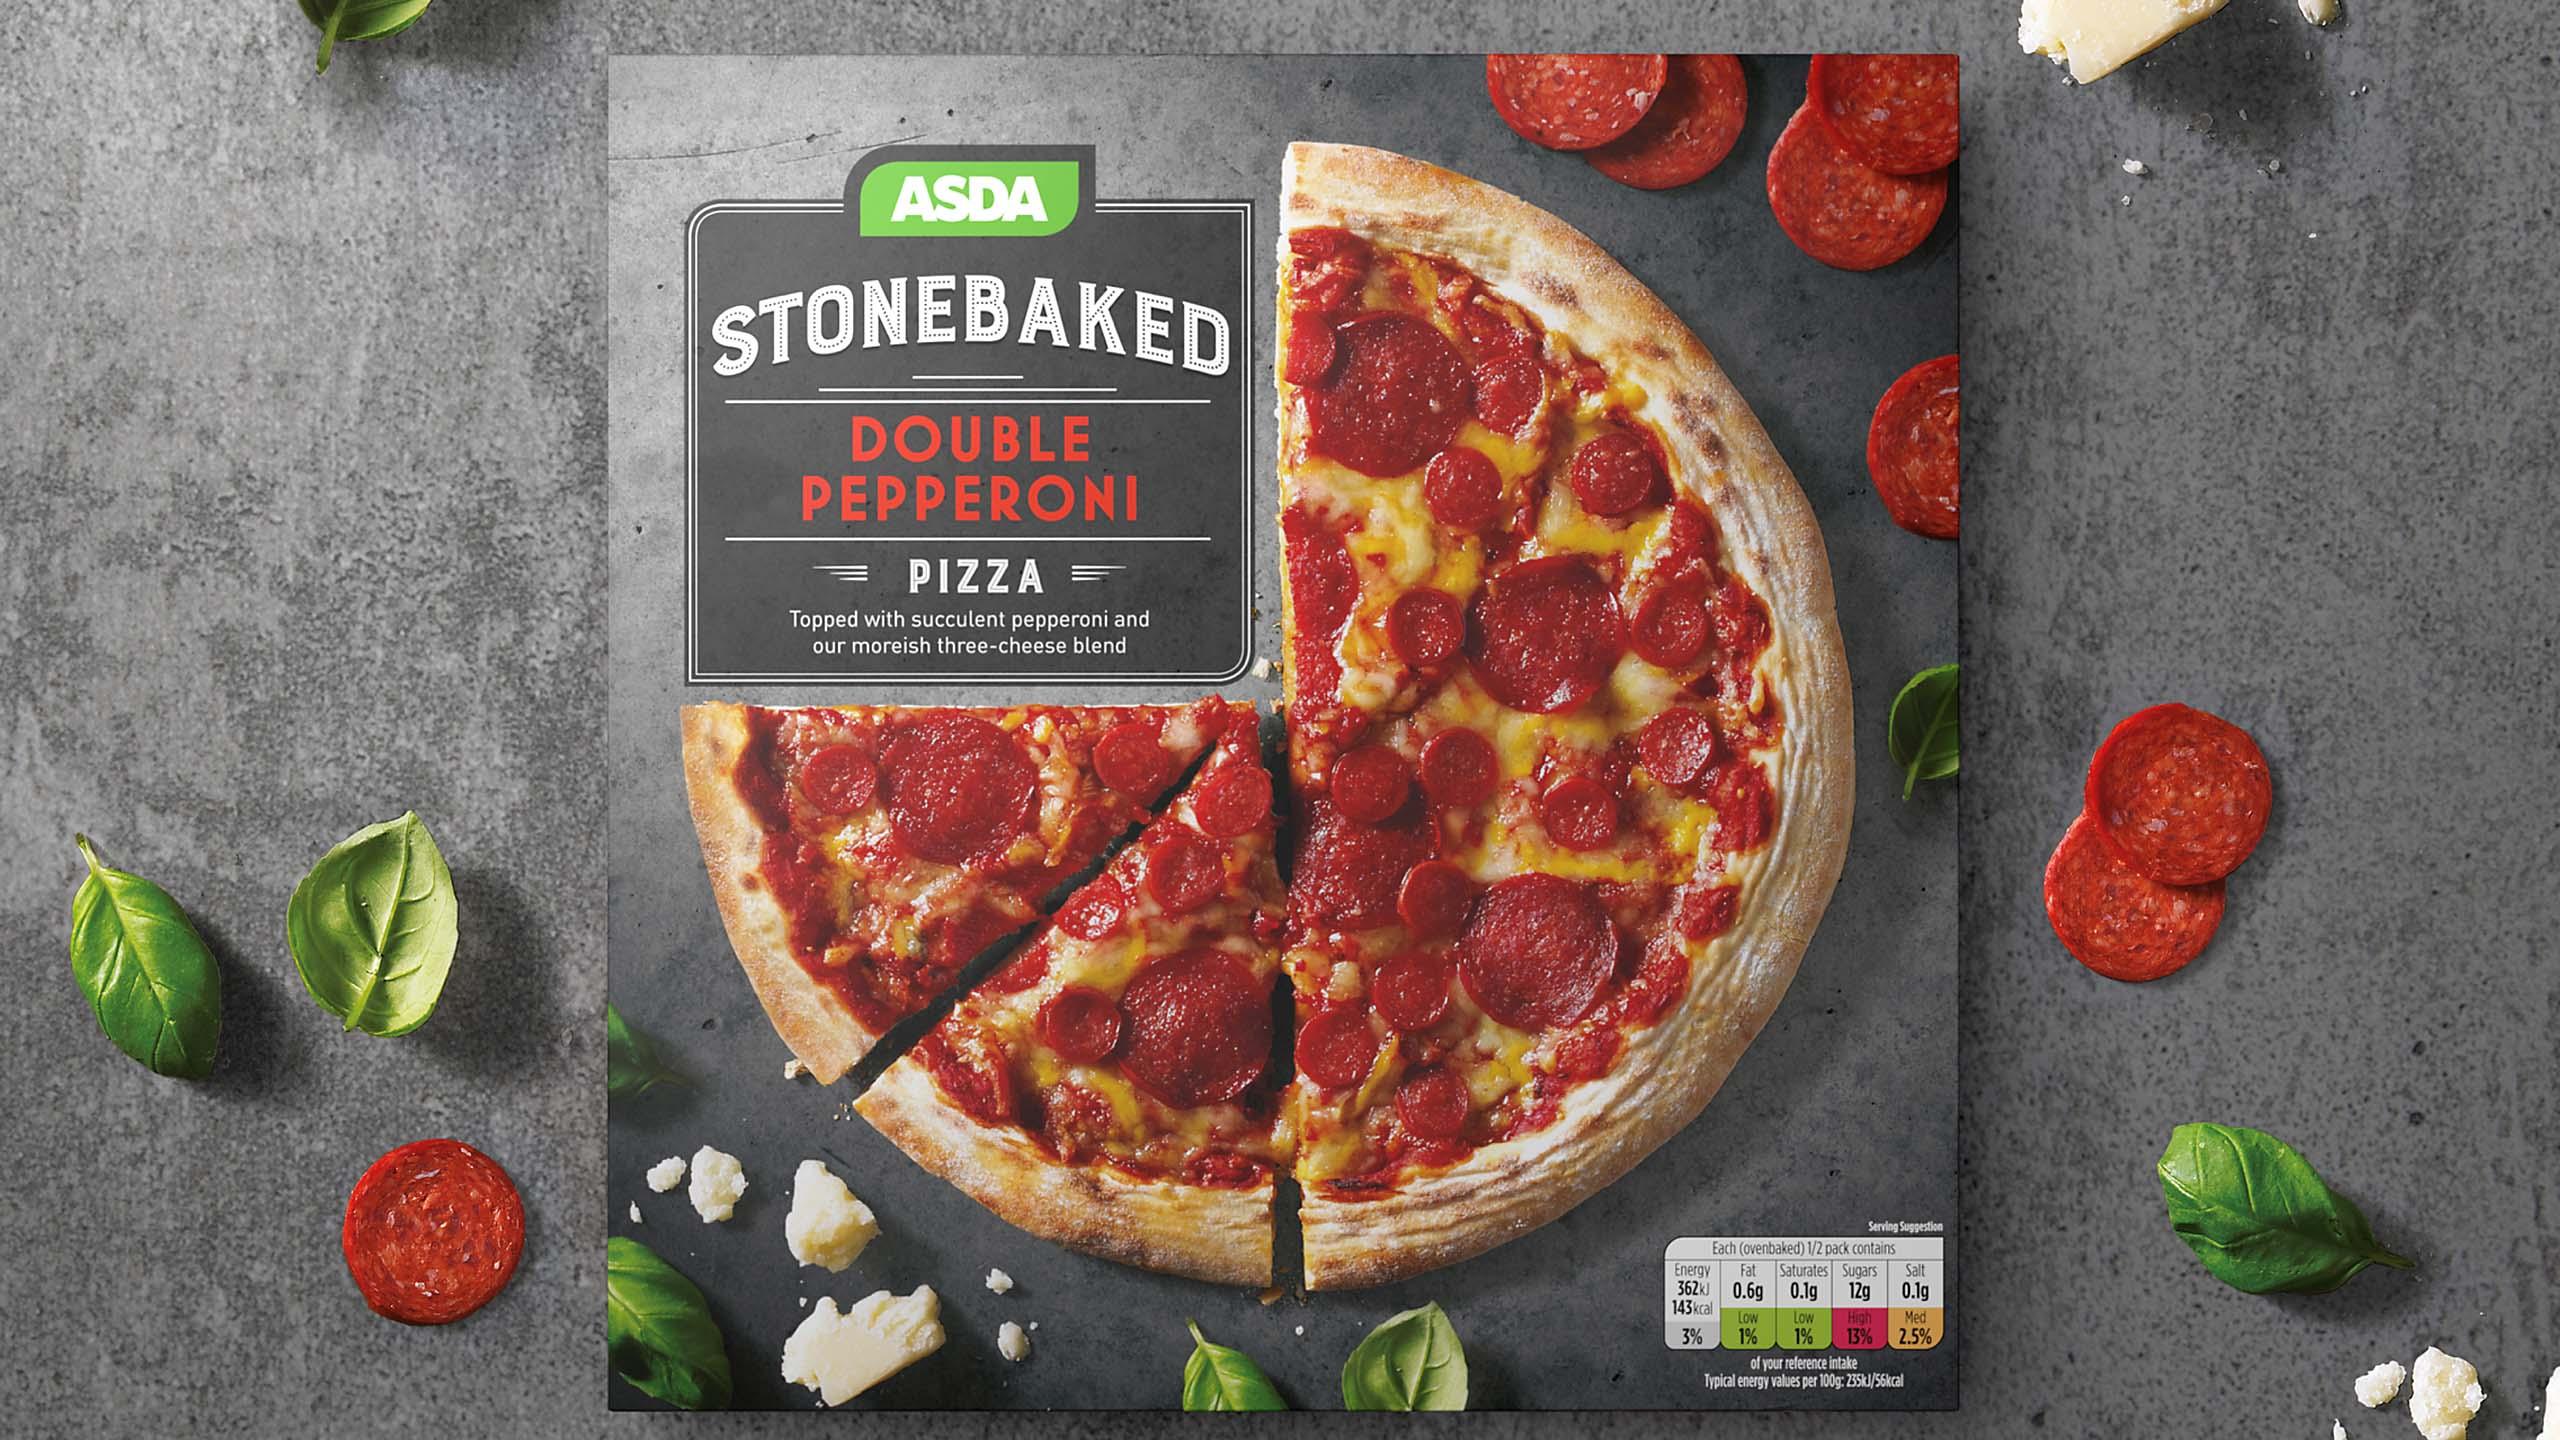 Mockup of ASDA frozen pizza box design